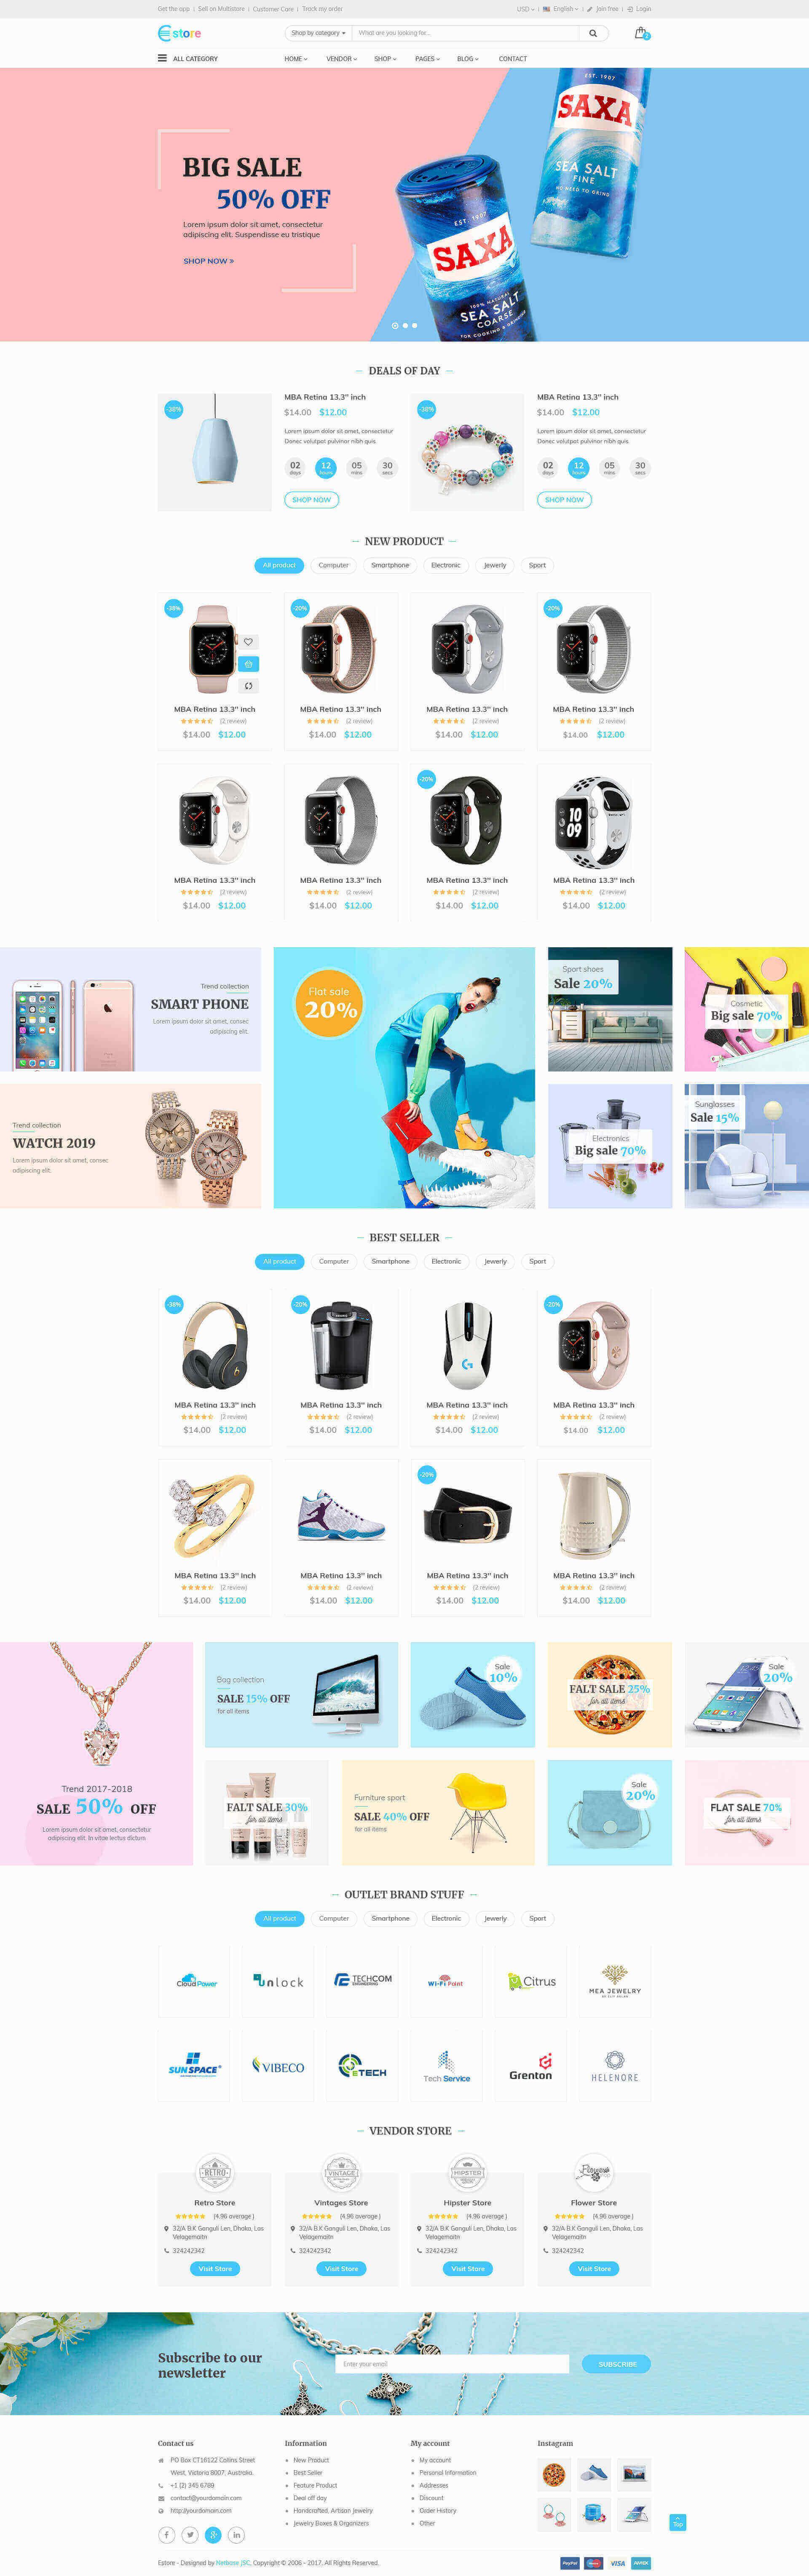 Ebay Homepage